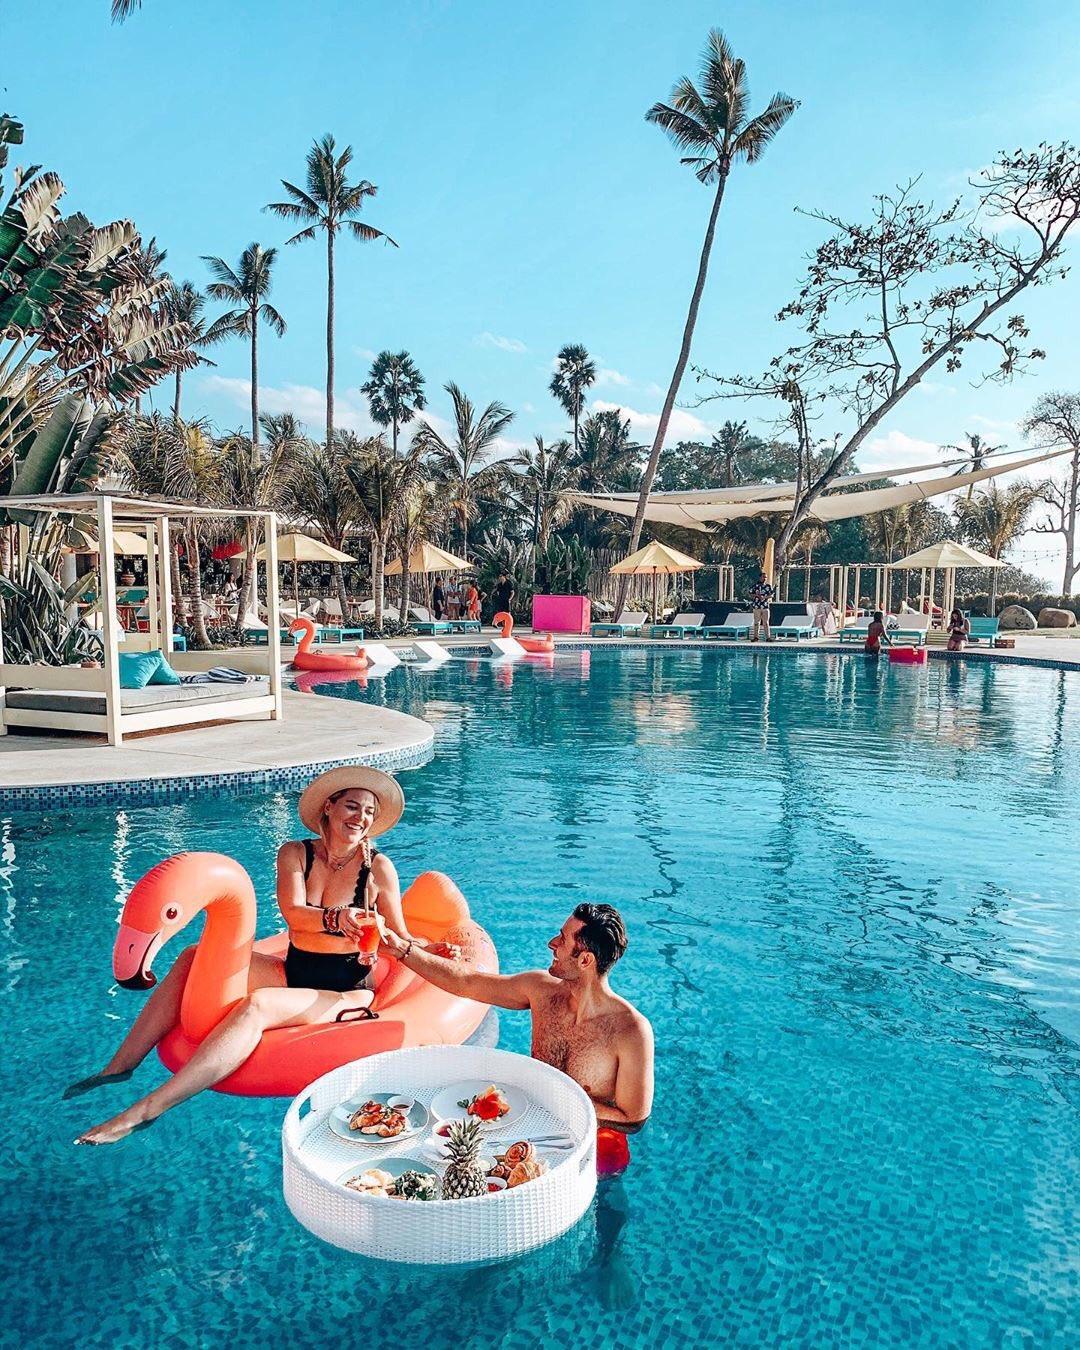 https://highend-traveller.com/flamingo-bali-beach-club-re-opens-on-the-12th-of-september/